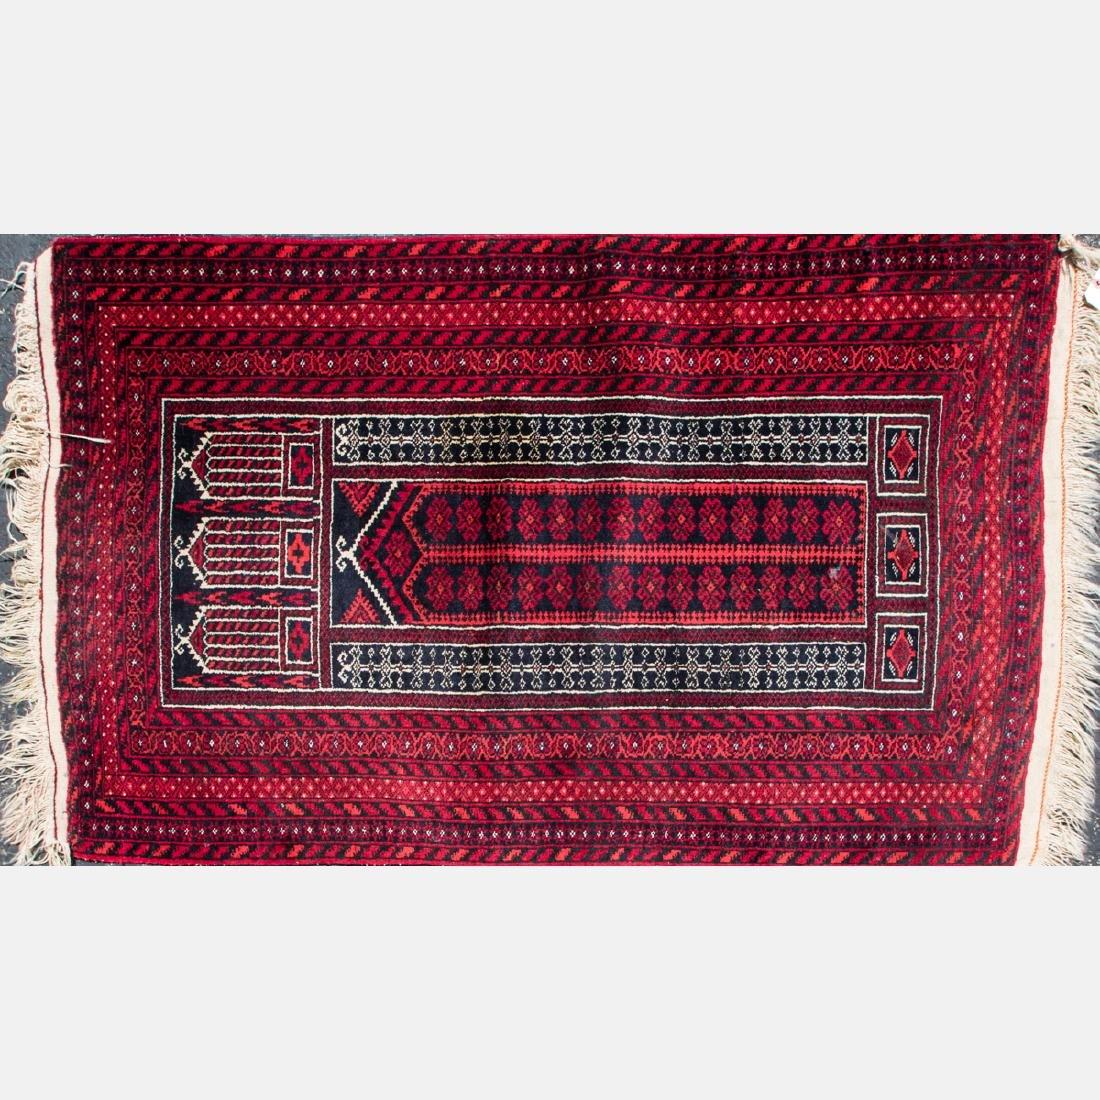 A Turkish Wool Rug, 20th Century.